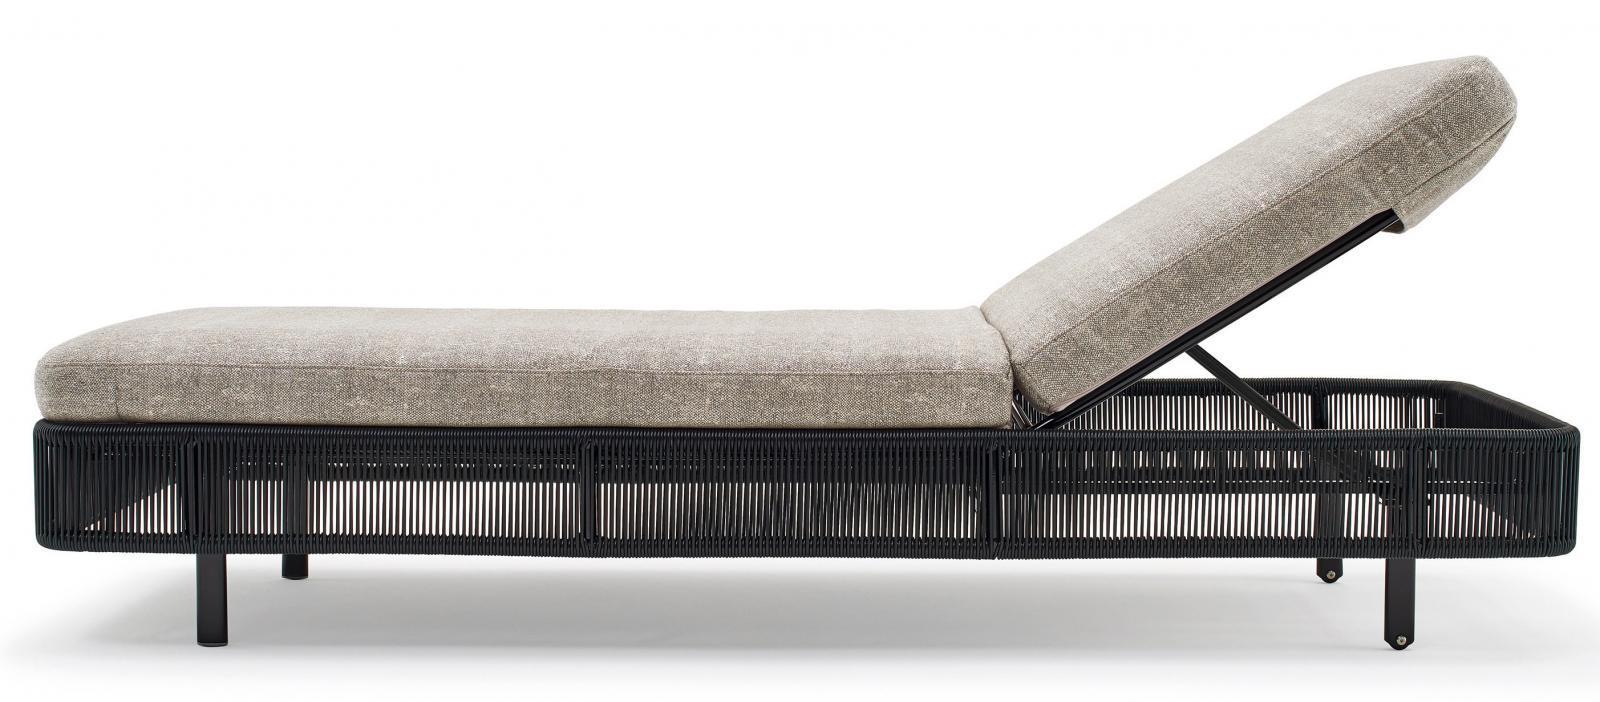 Шезлонг-лежак плетеный Tibidabo